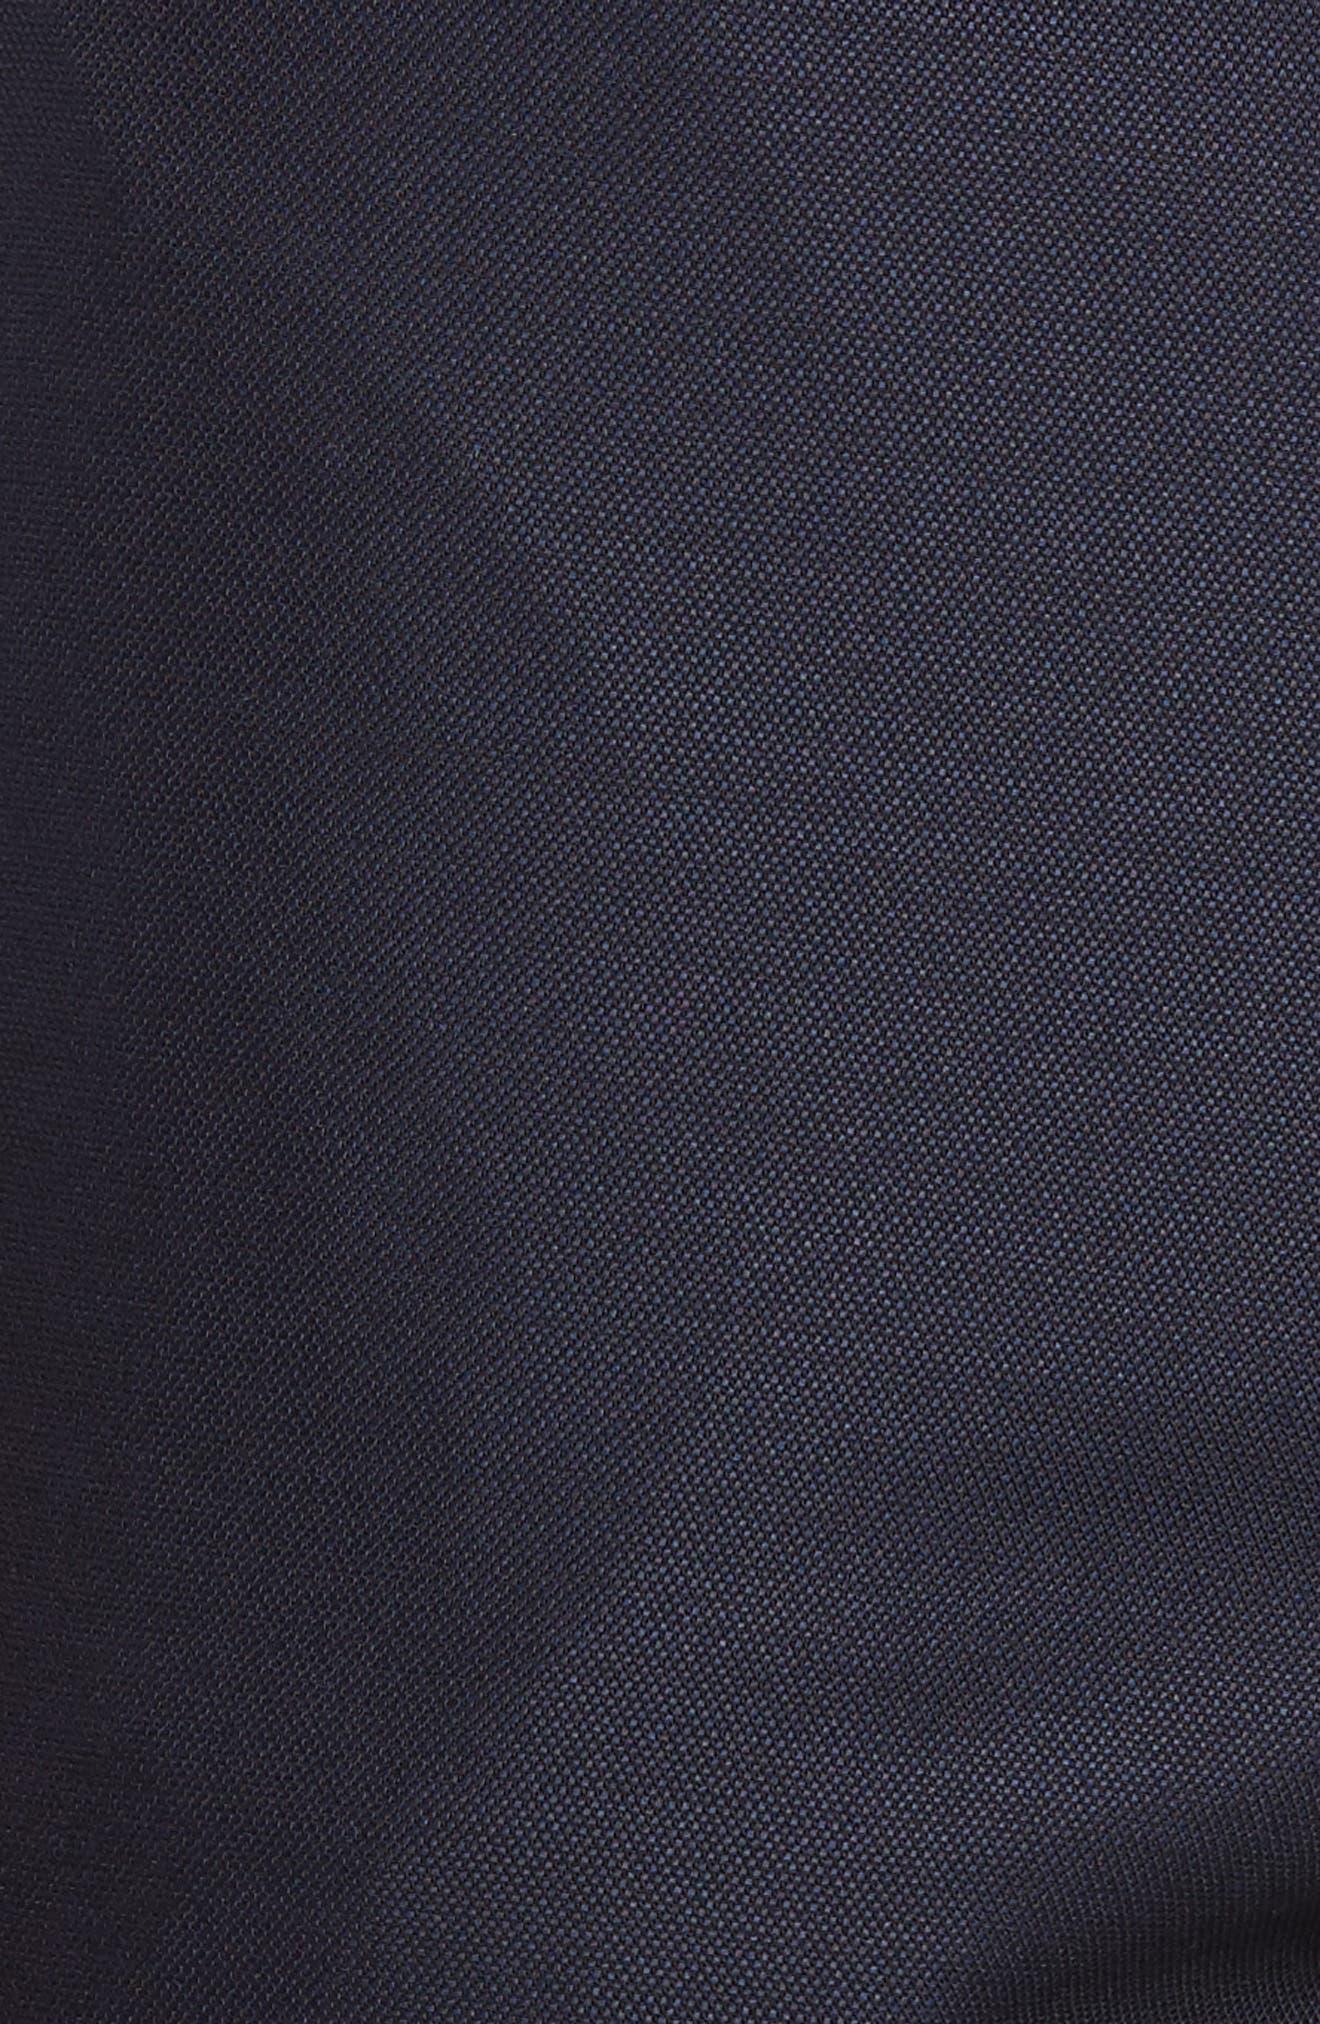 Alternate Image 5  - Bensol Pin Dot Wool Trousers